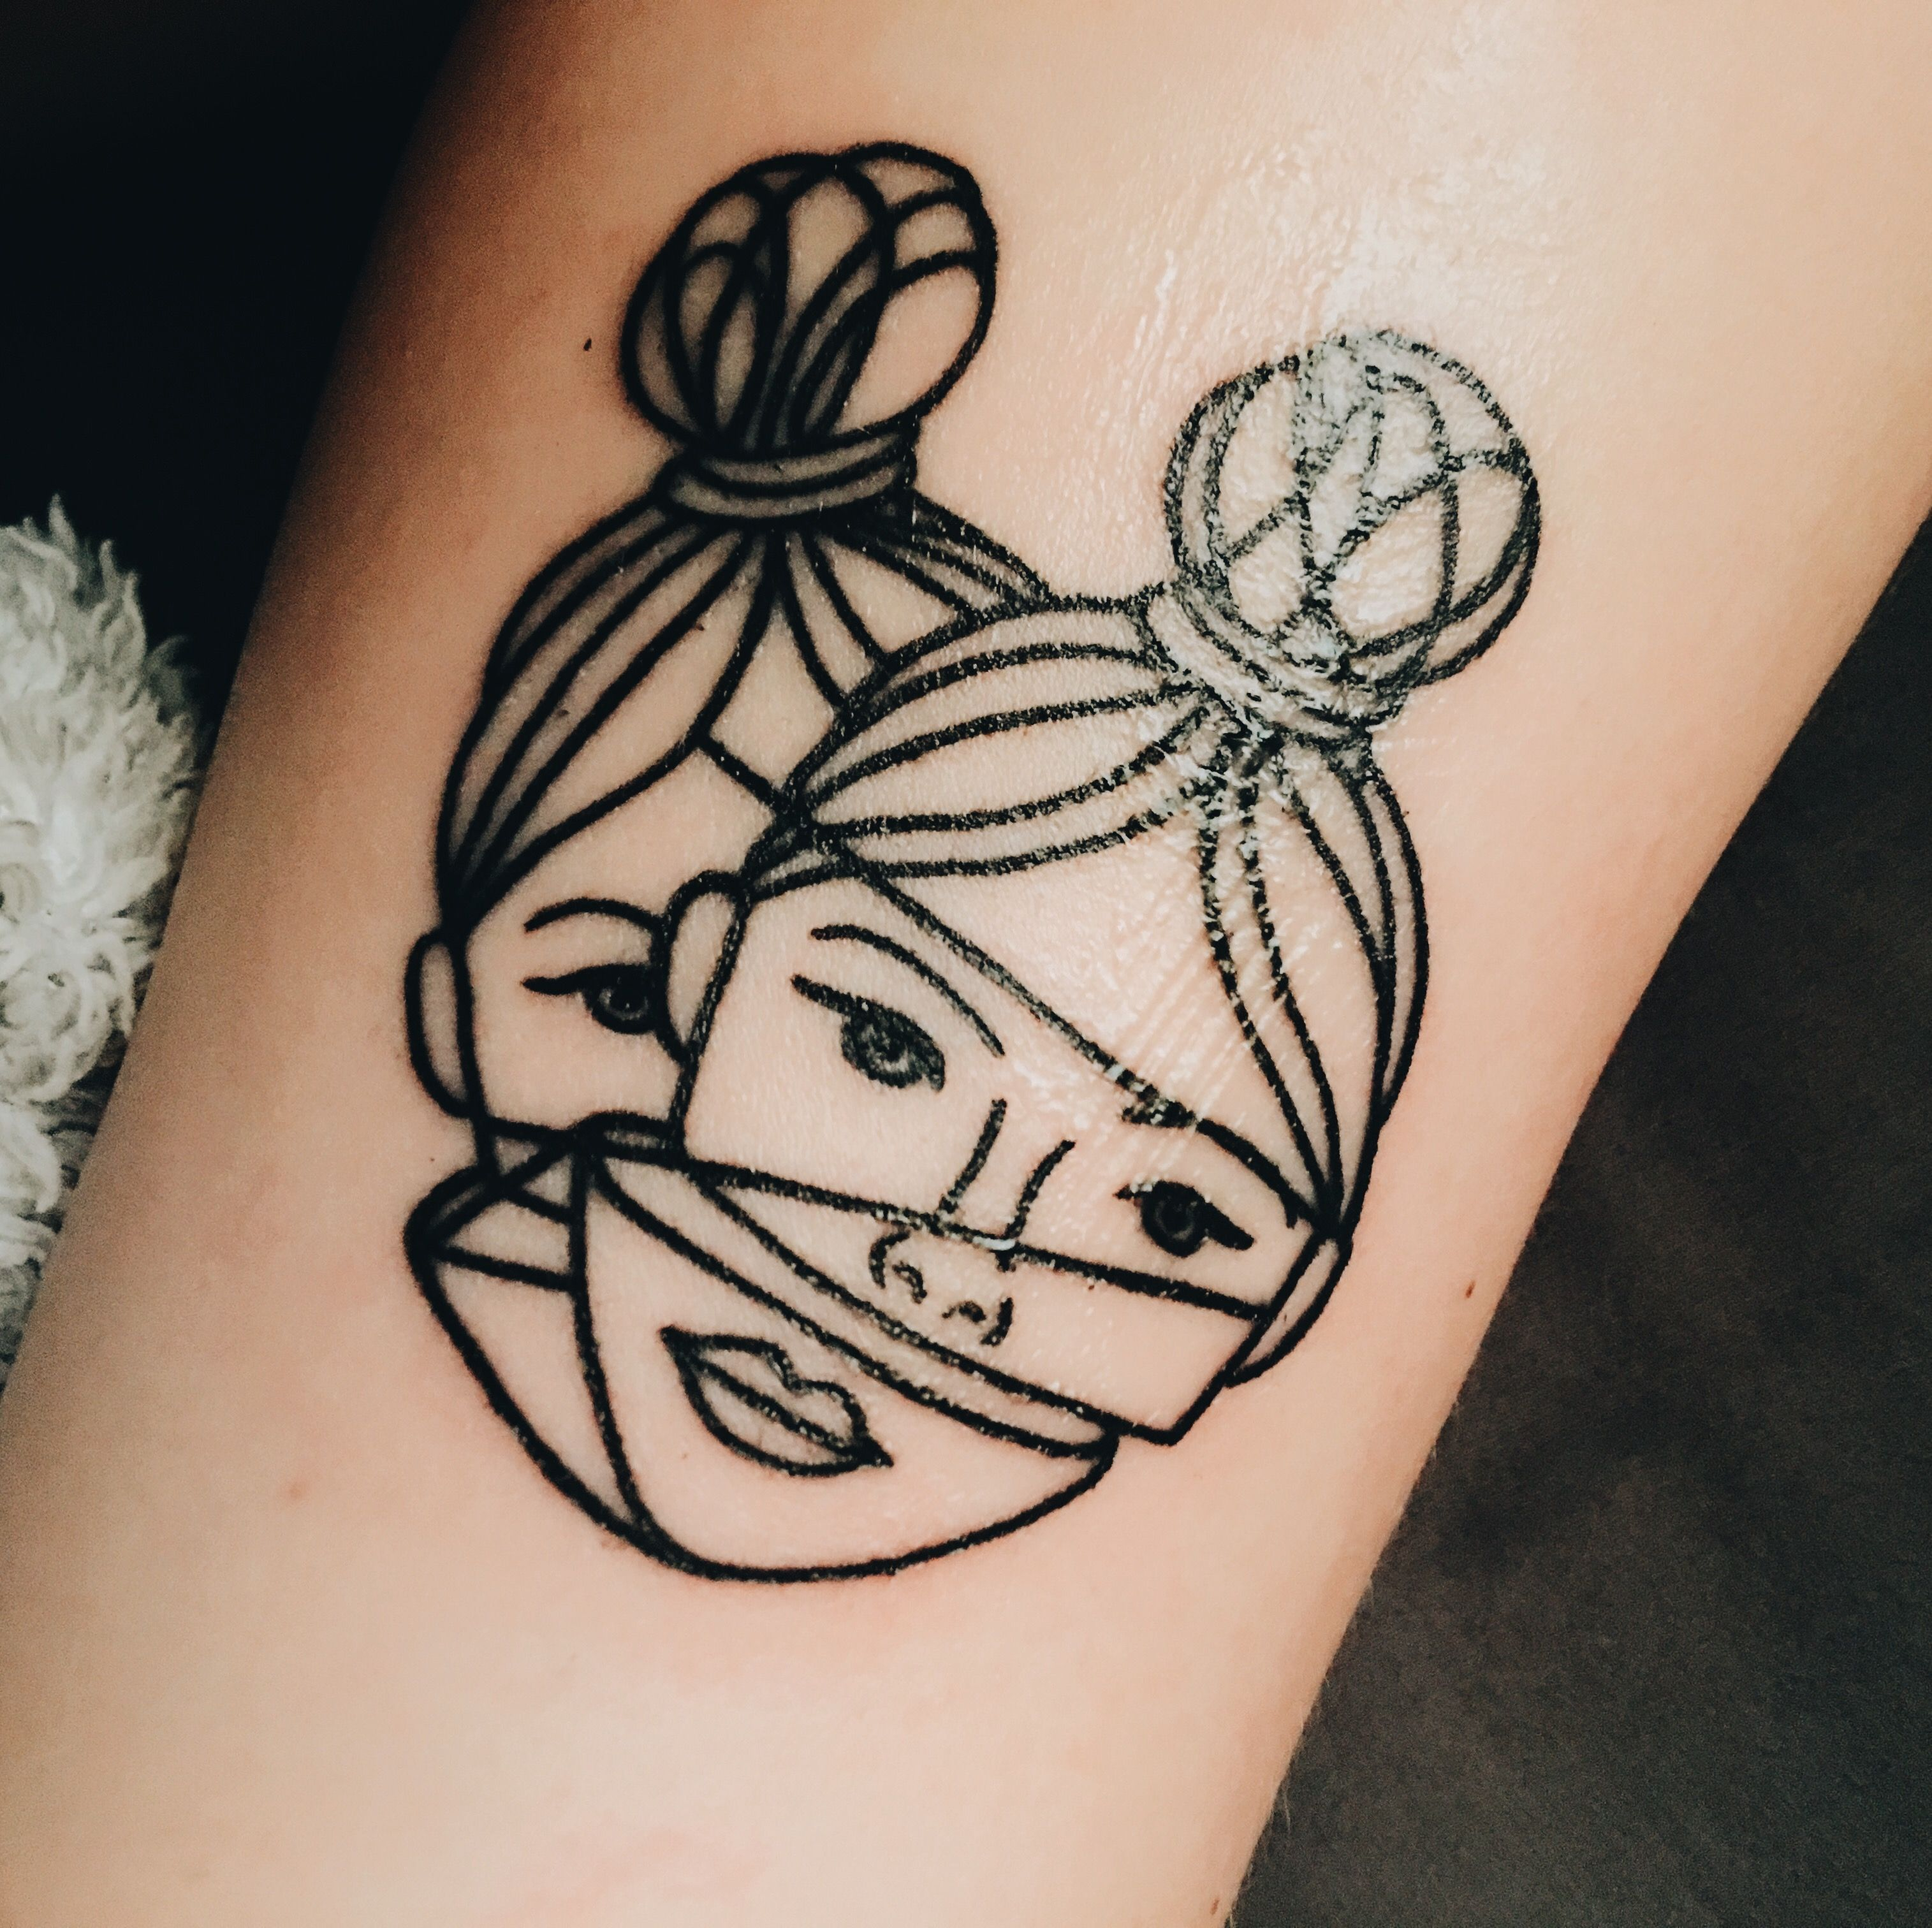 Pin by Elina Farhang on Tattoos Tattoos, Tattoo designs